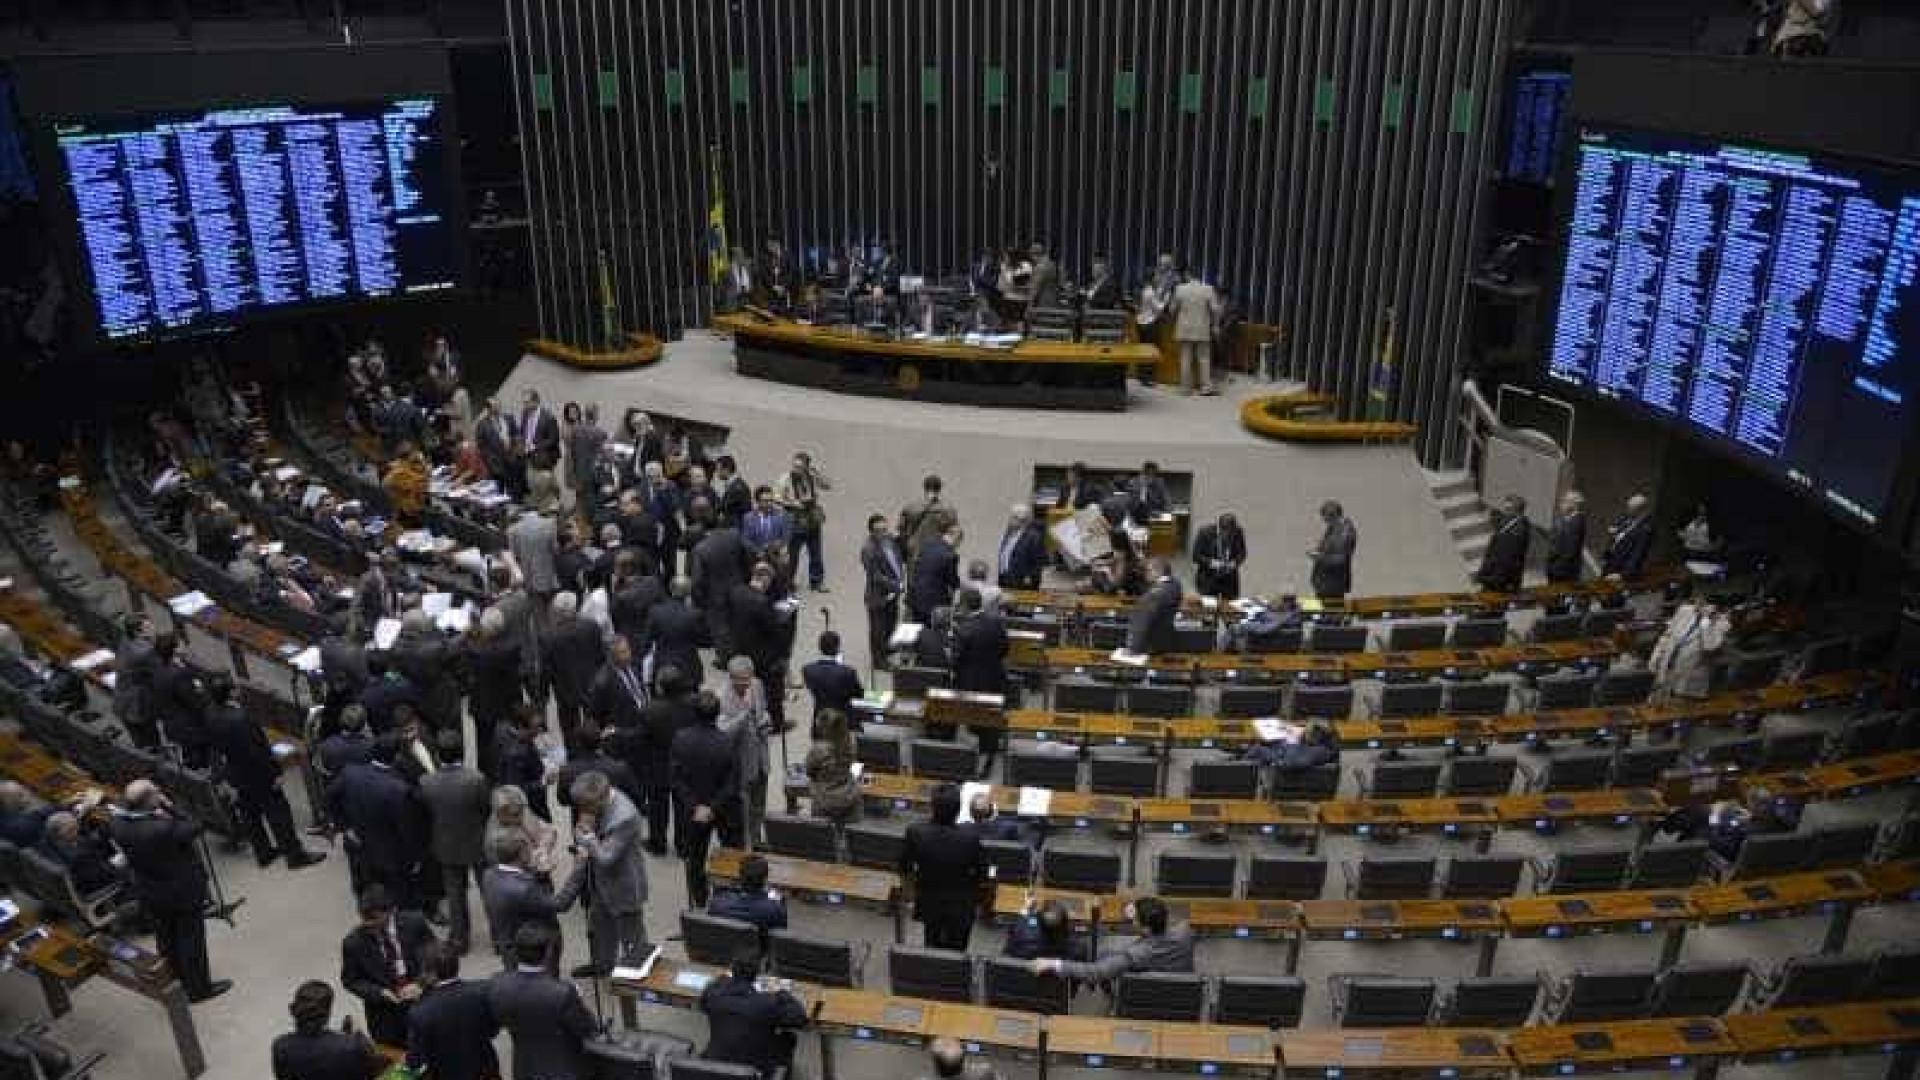 Comitê pró-impeachment diz ter 346 votos pelo afastamento de Dilma